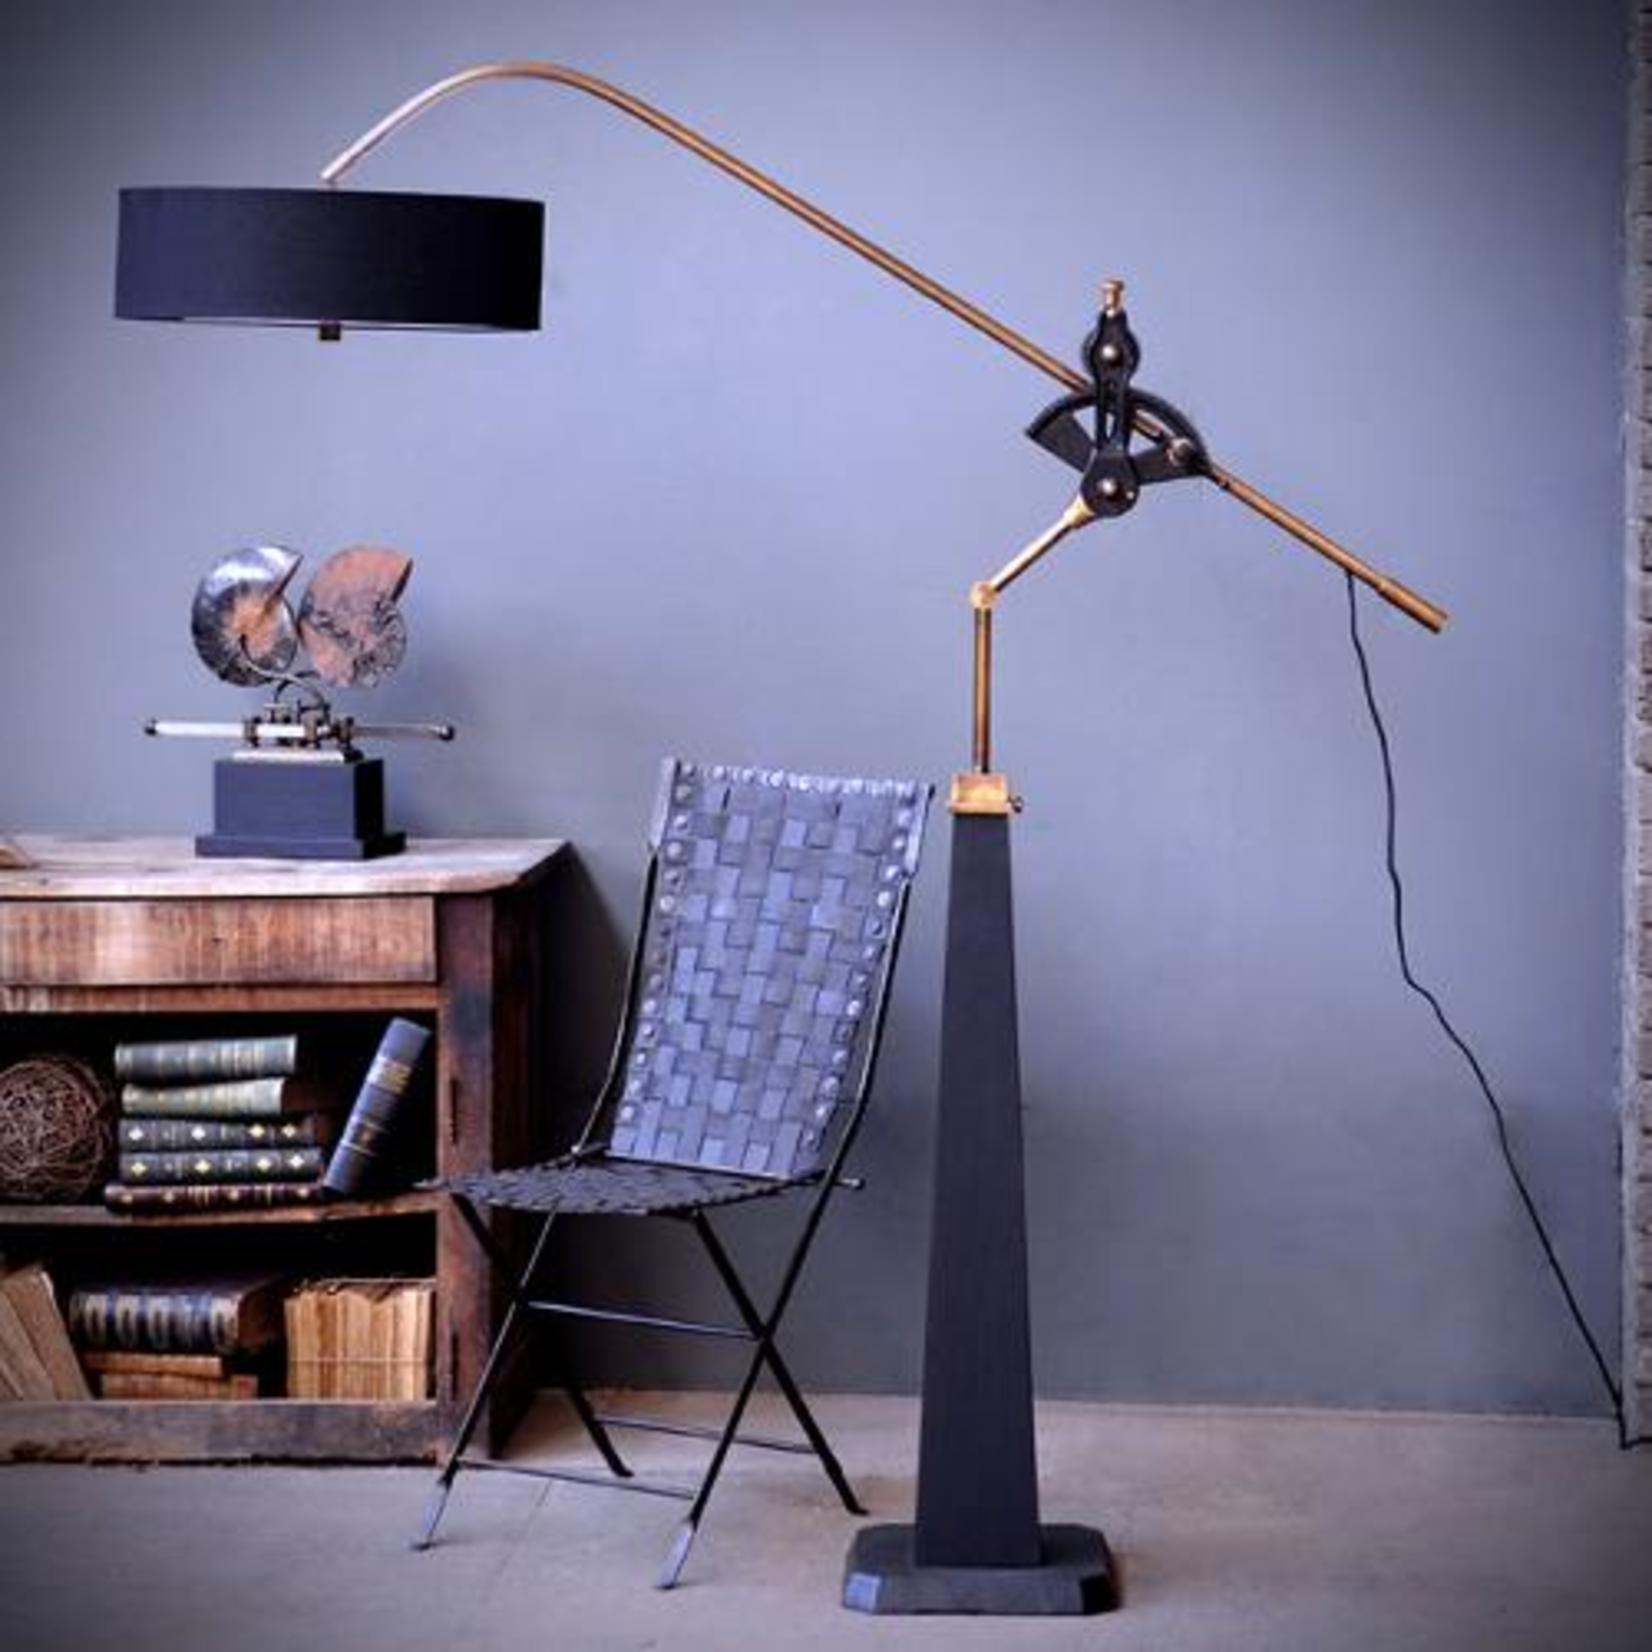 OBJET DE CURIOSITE TECHNICAL LAMPFLOOR